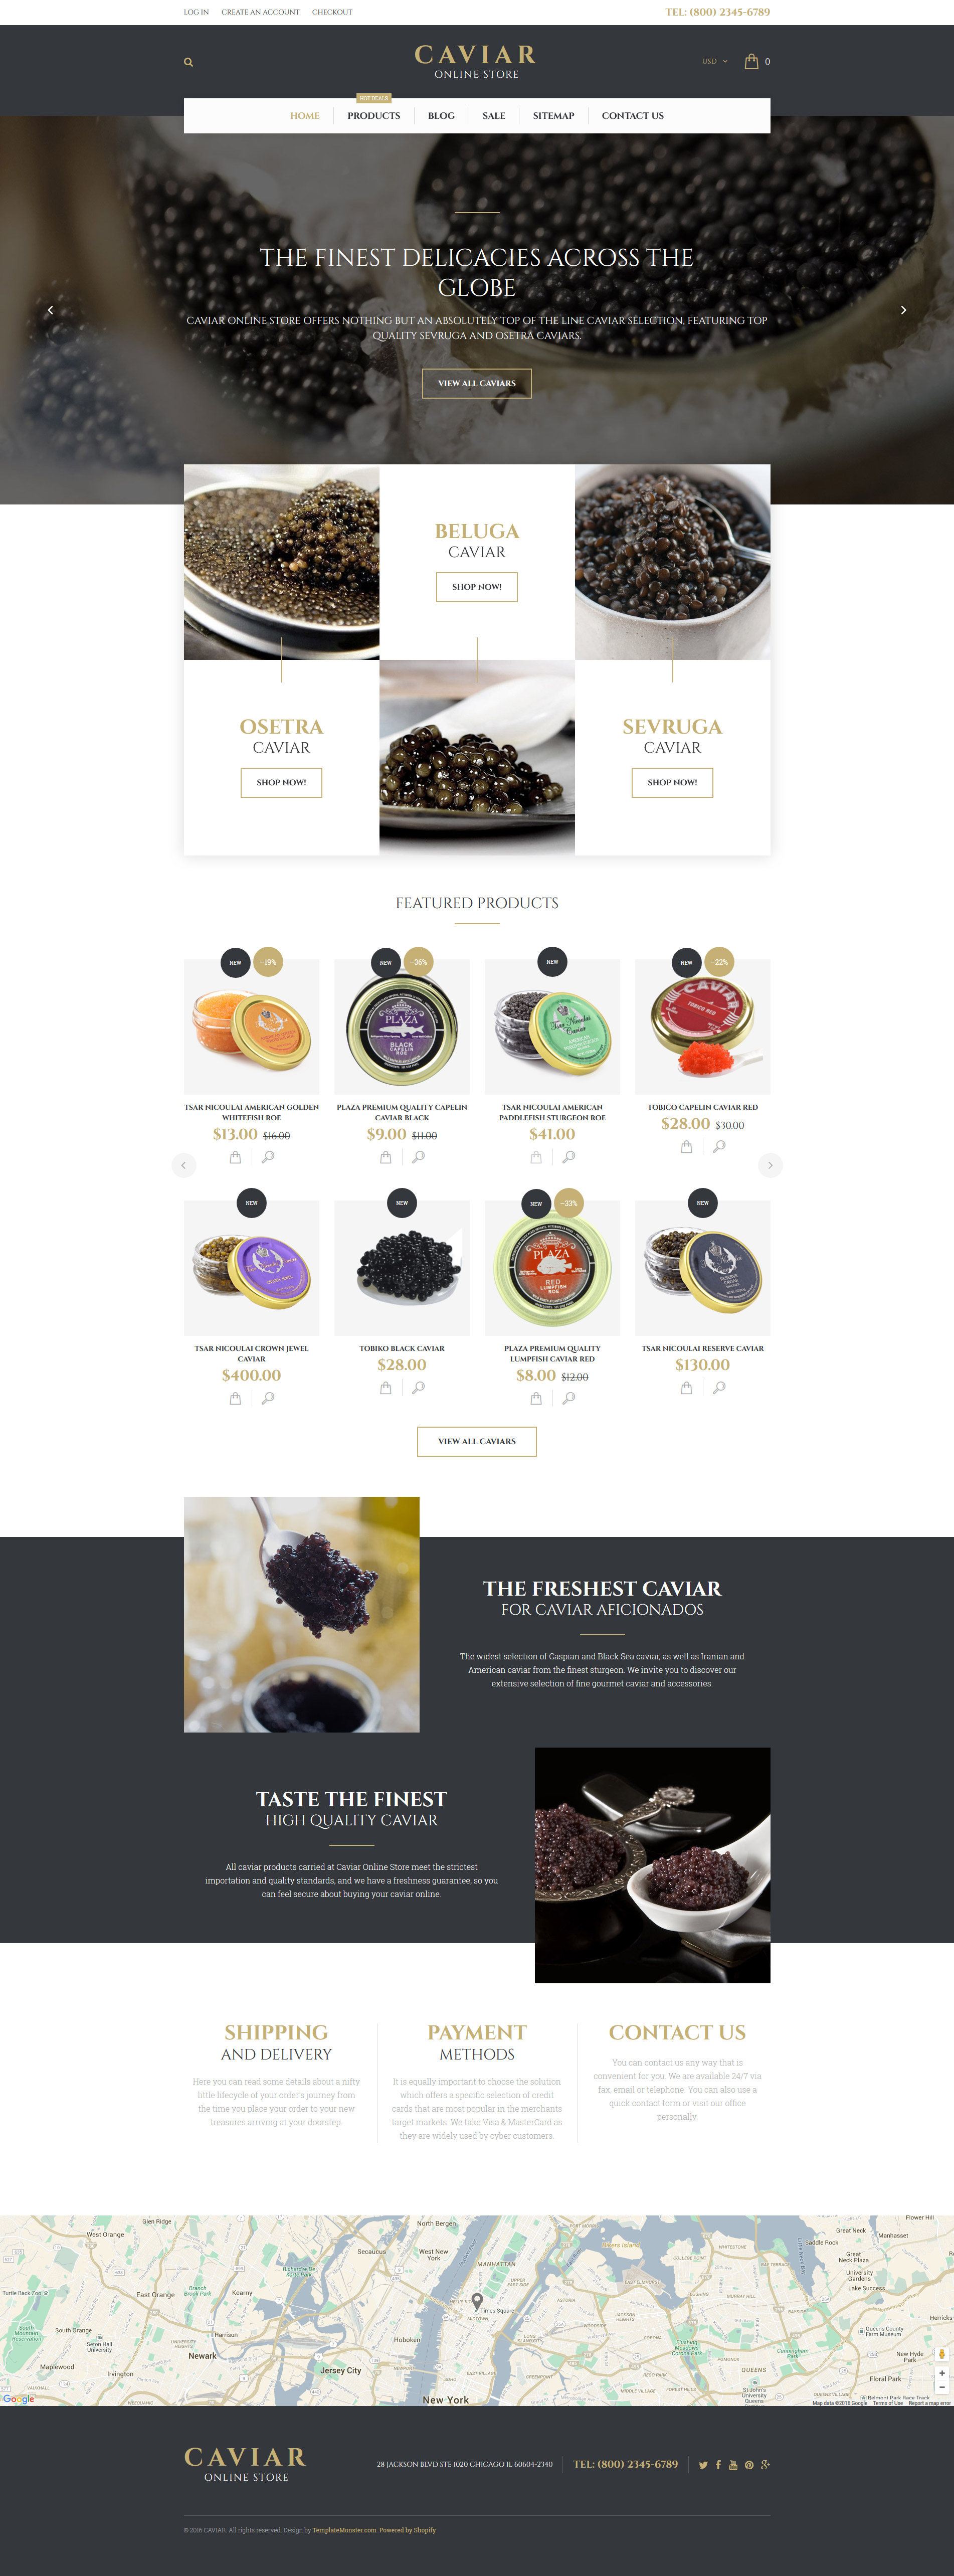 Caviar Shopify Theme - screenshot